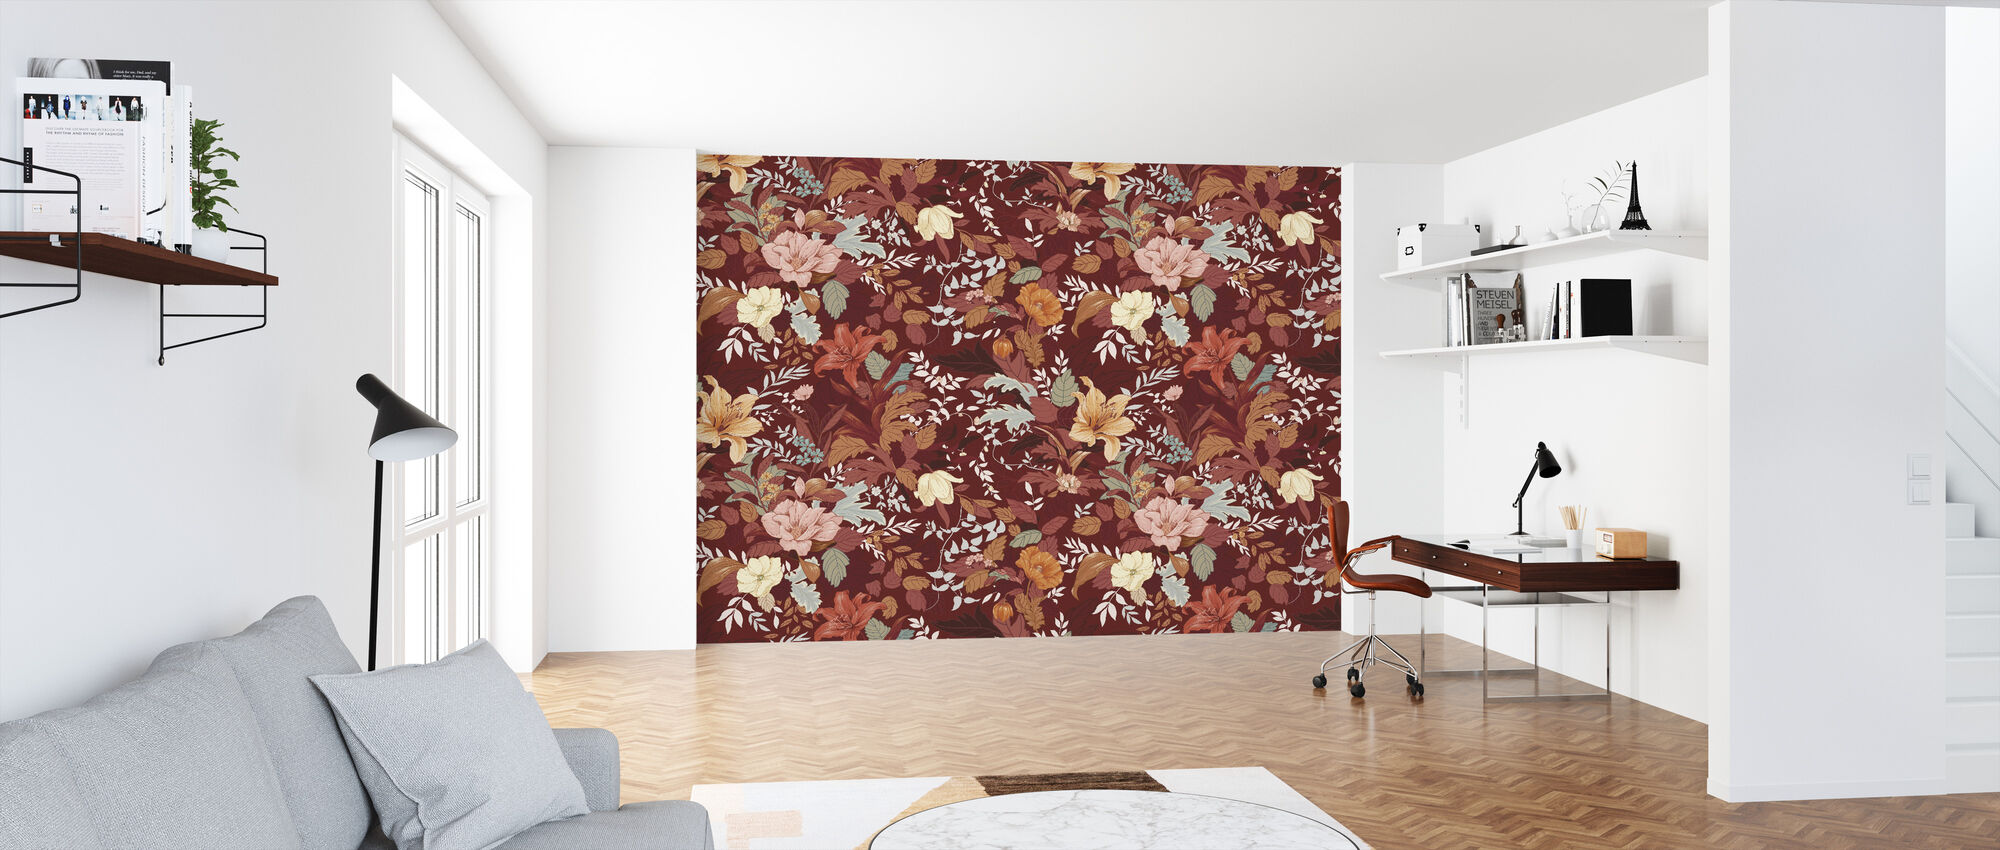 Allure - Jagger Orange - Wallpaper - Office